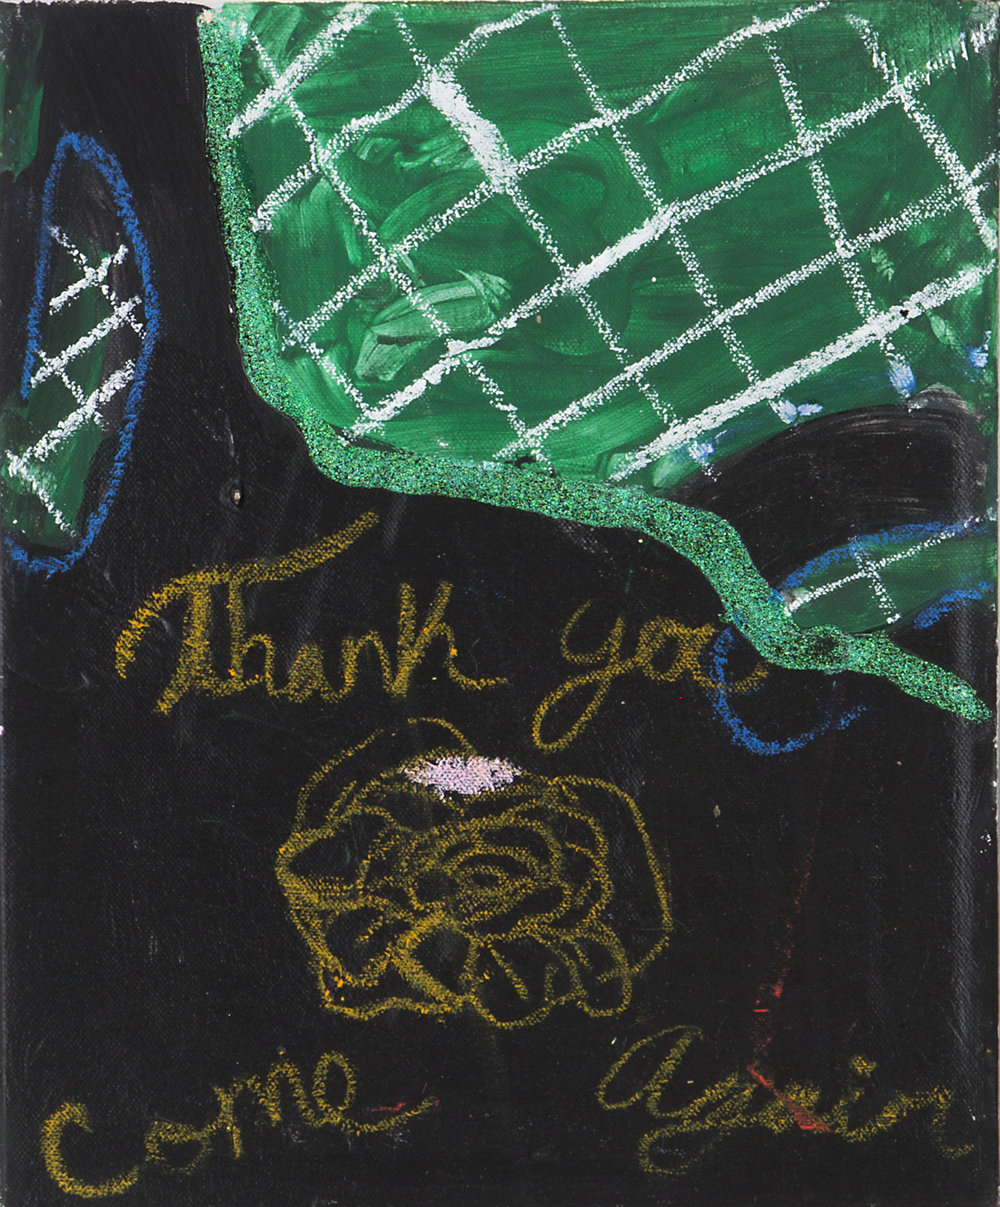 Jonathan Lyndon Chase   Bag on empty lot  2018 Acrylic, oil stick, marker, plastic toy gun, found plastic on canvas 35.5 x 28 cm